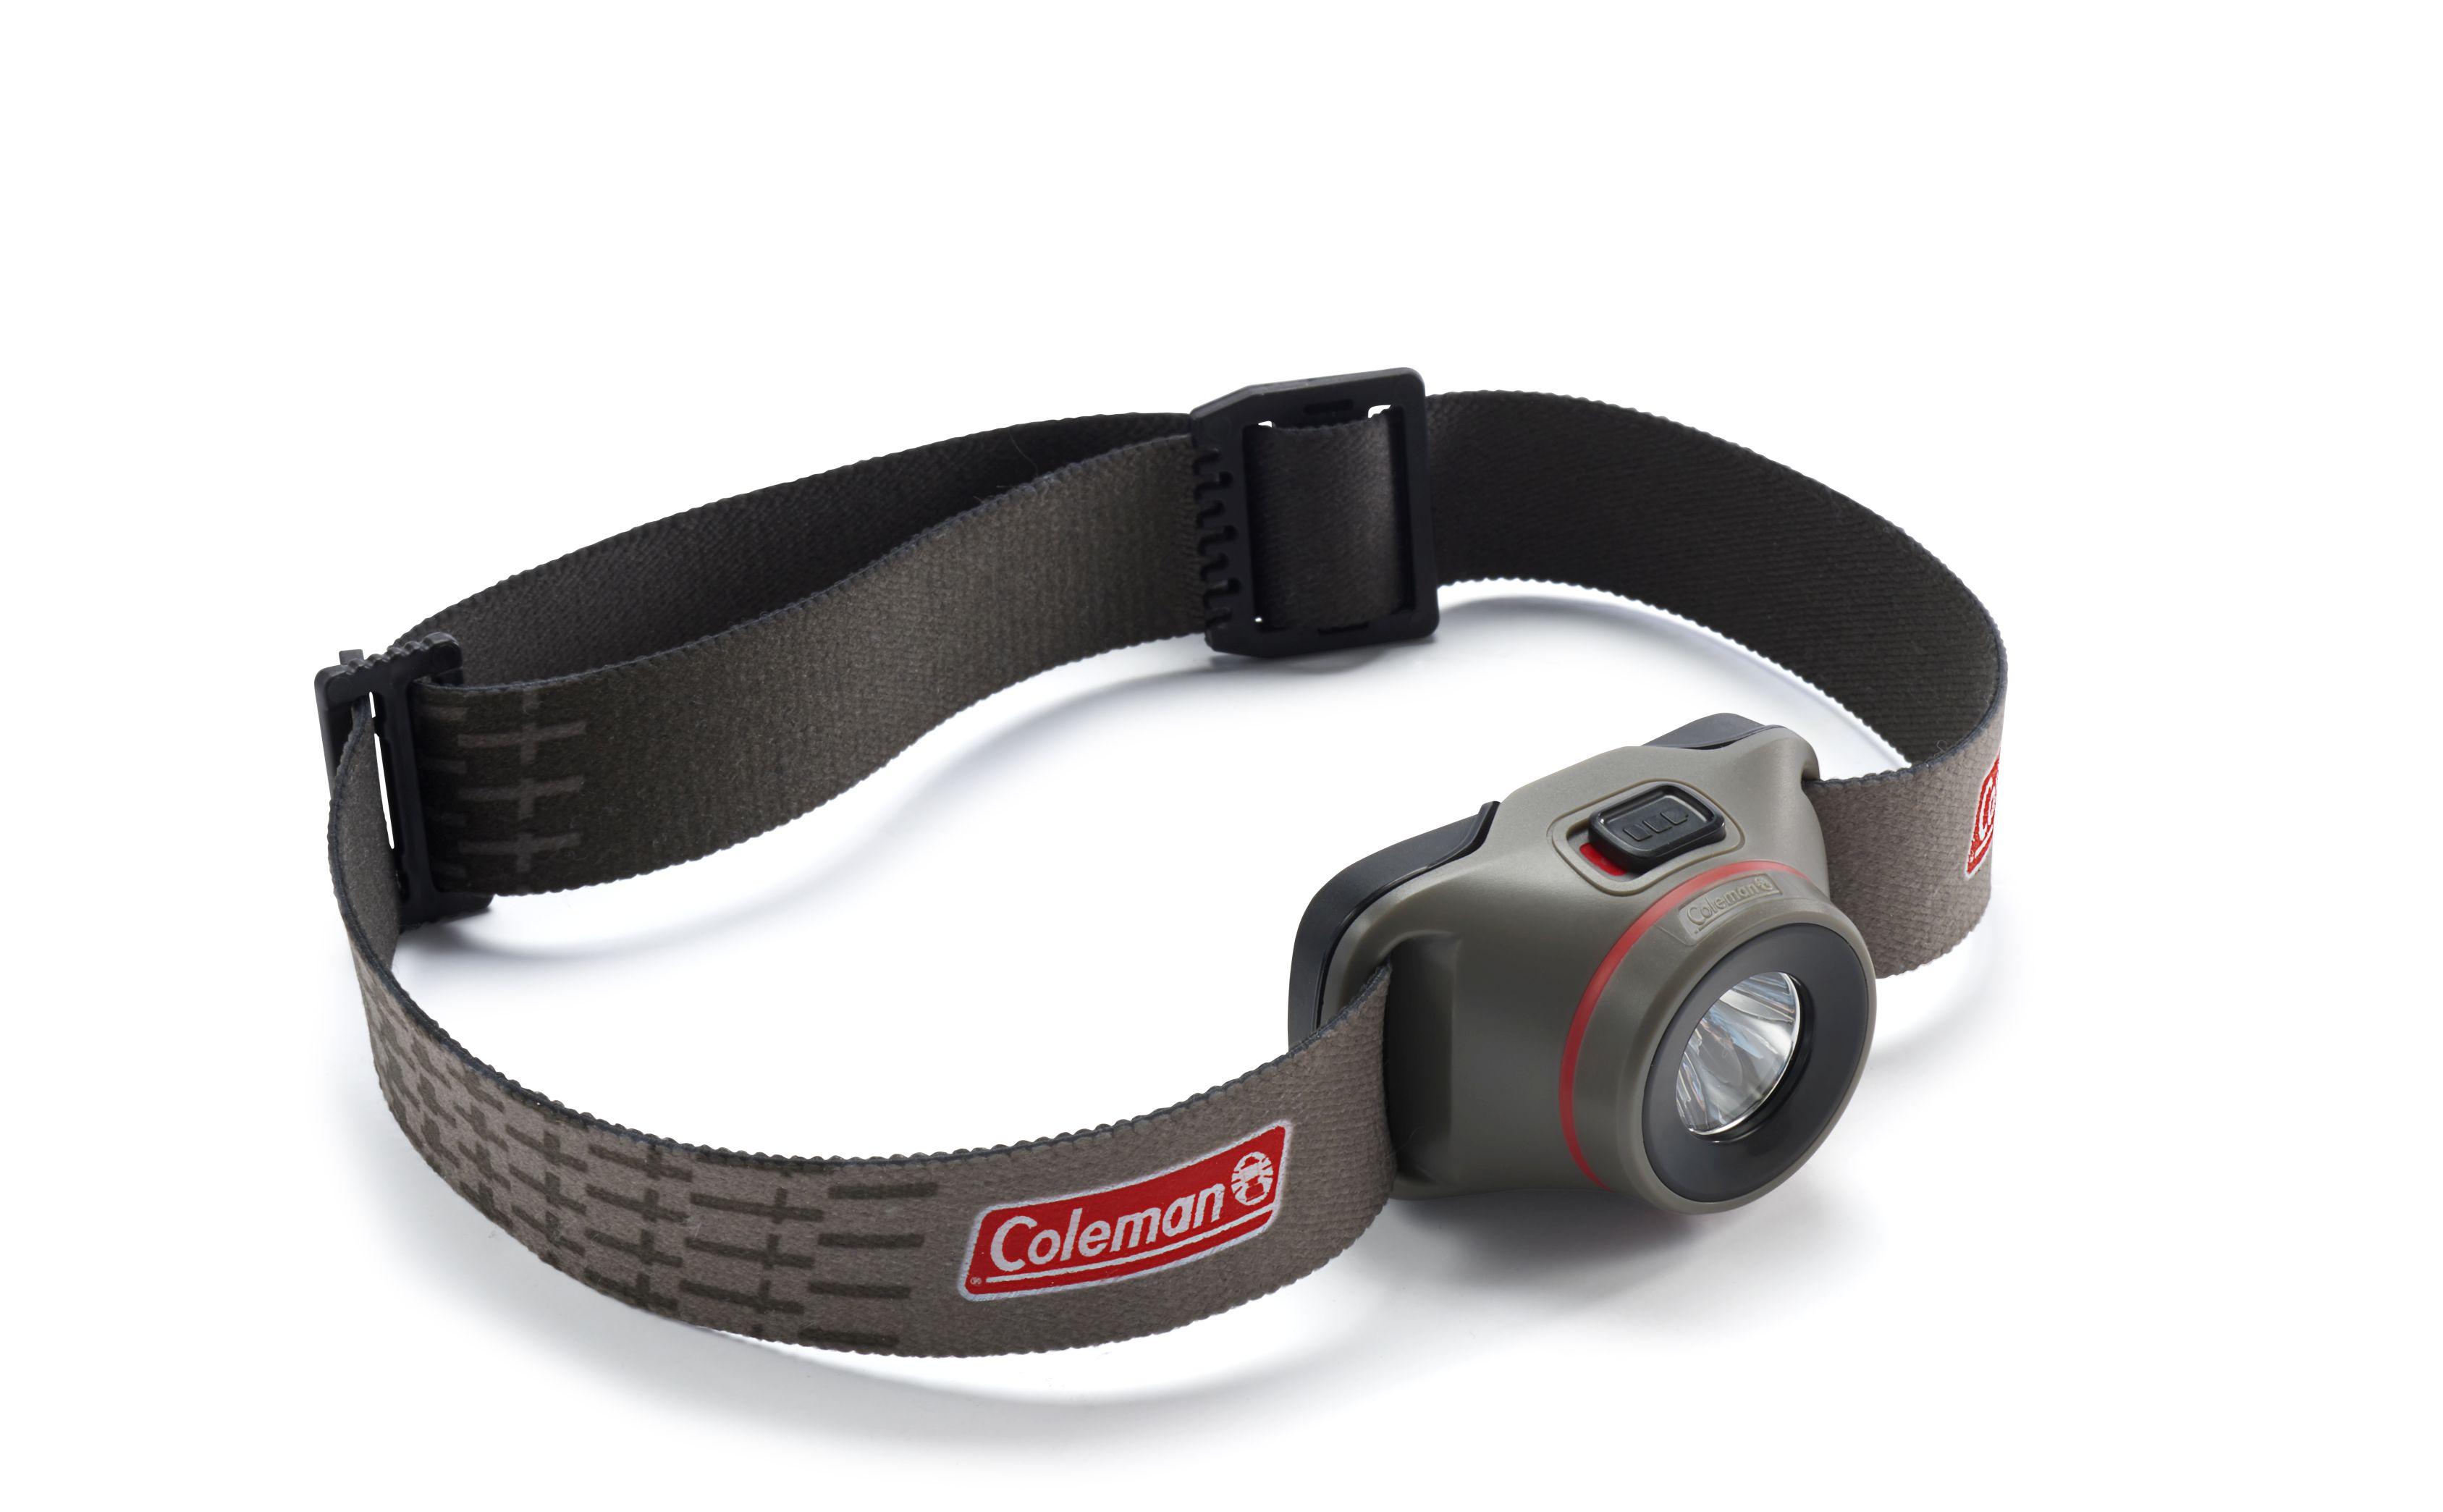 Coleman Batteryguard 100l Headlamp